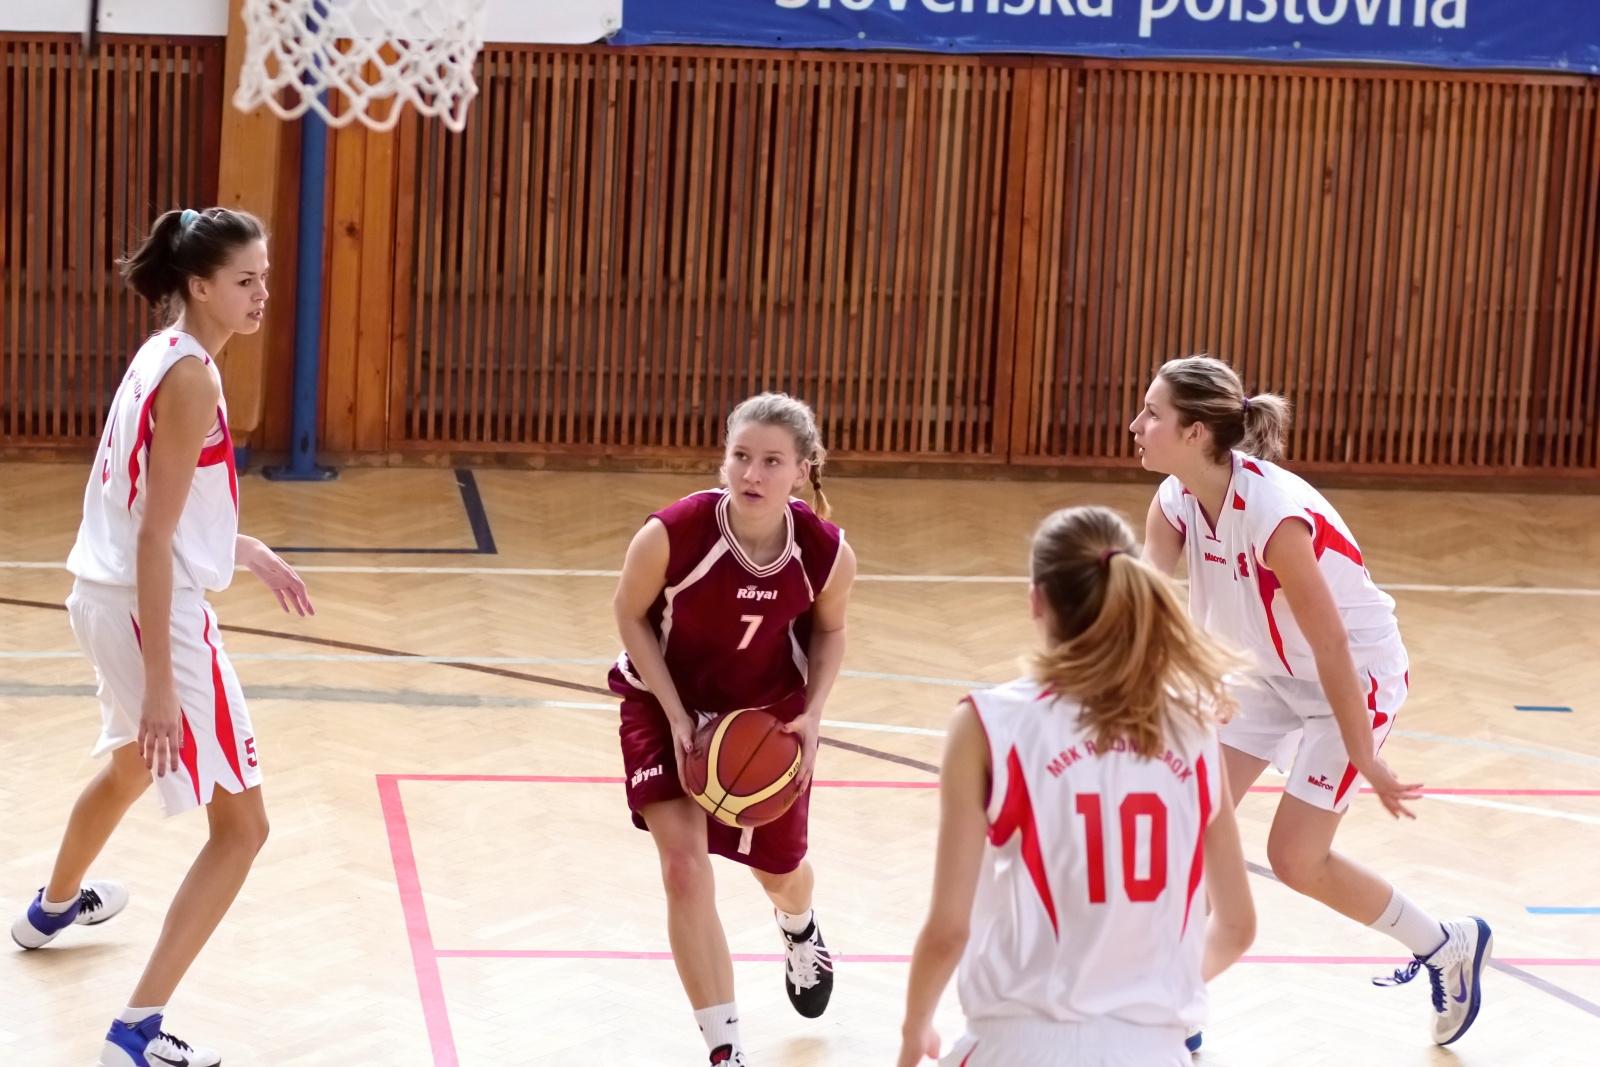 bk-zvolen-mbk-ruzomberok-juniorky-basketbal-5